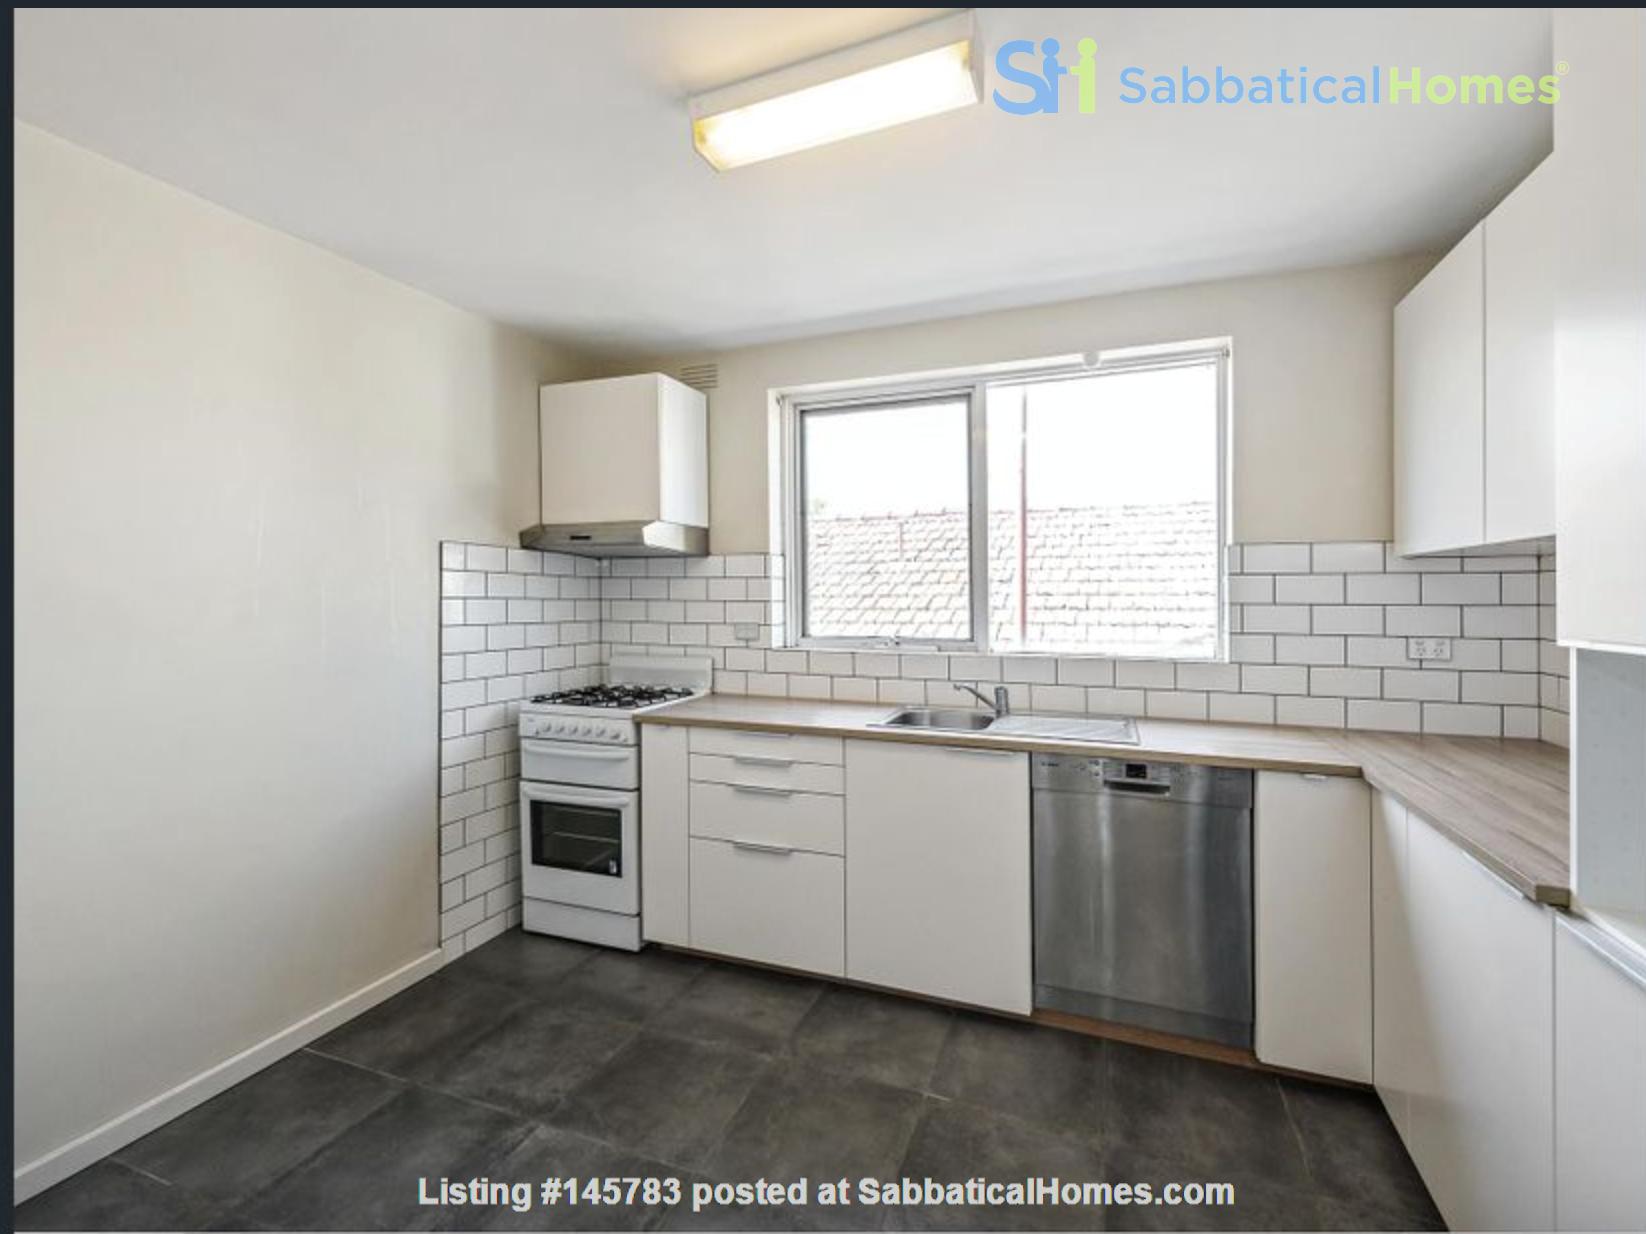 2 bedroom apartment in inner city Melbourne Home Rental in St Kilda East 0